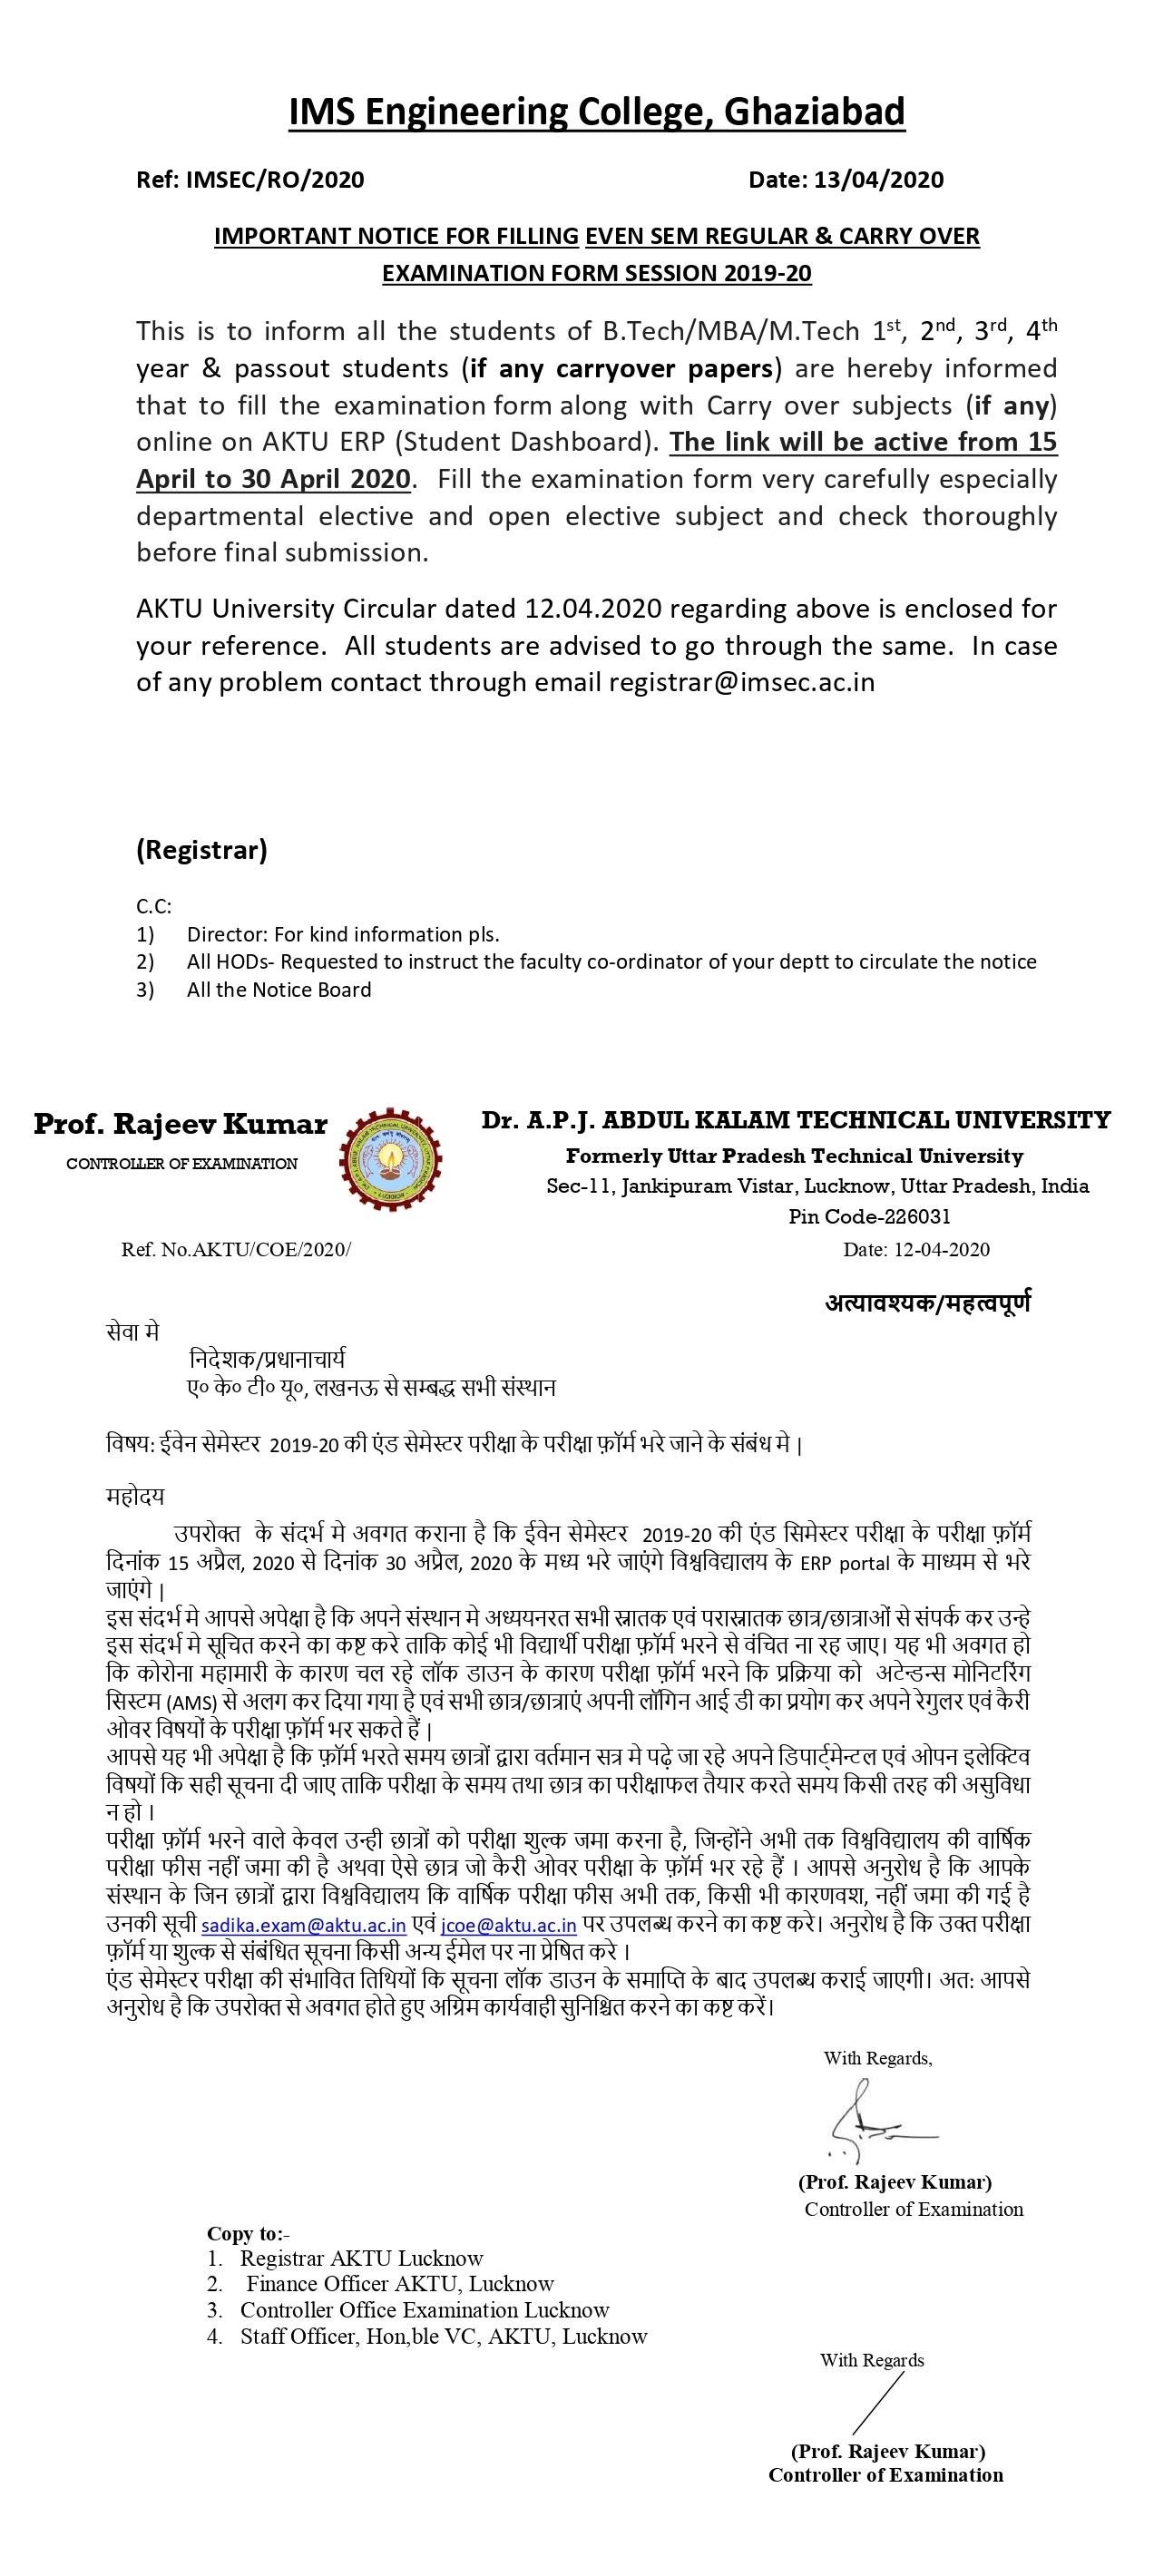 Notice For Filling Even Sem Regular & Carry Over Examination Form Session 2019-20